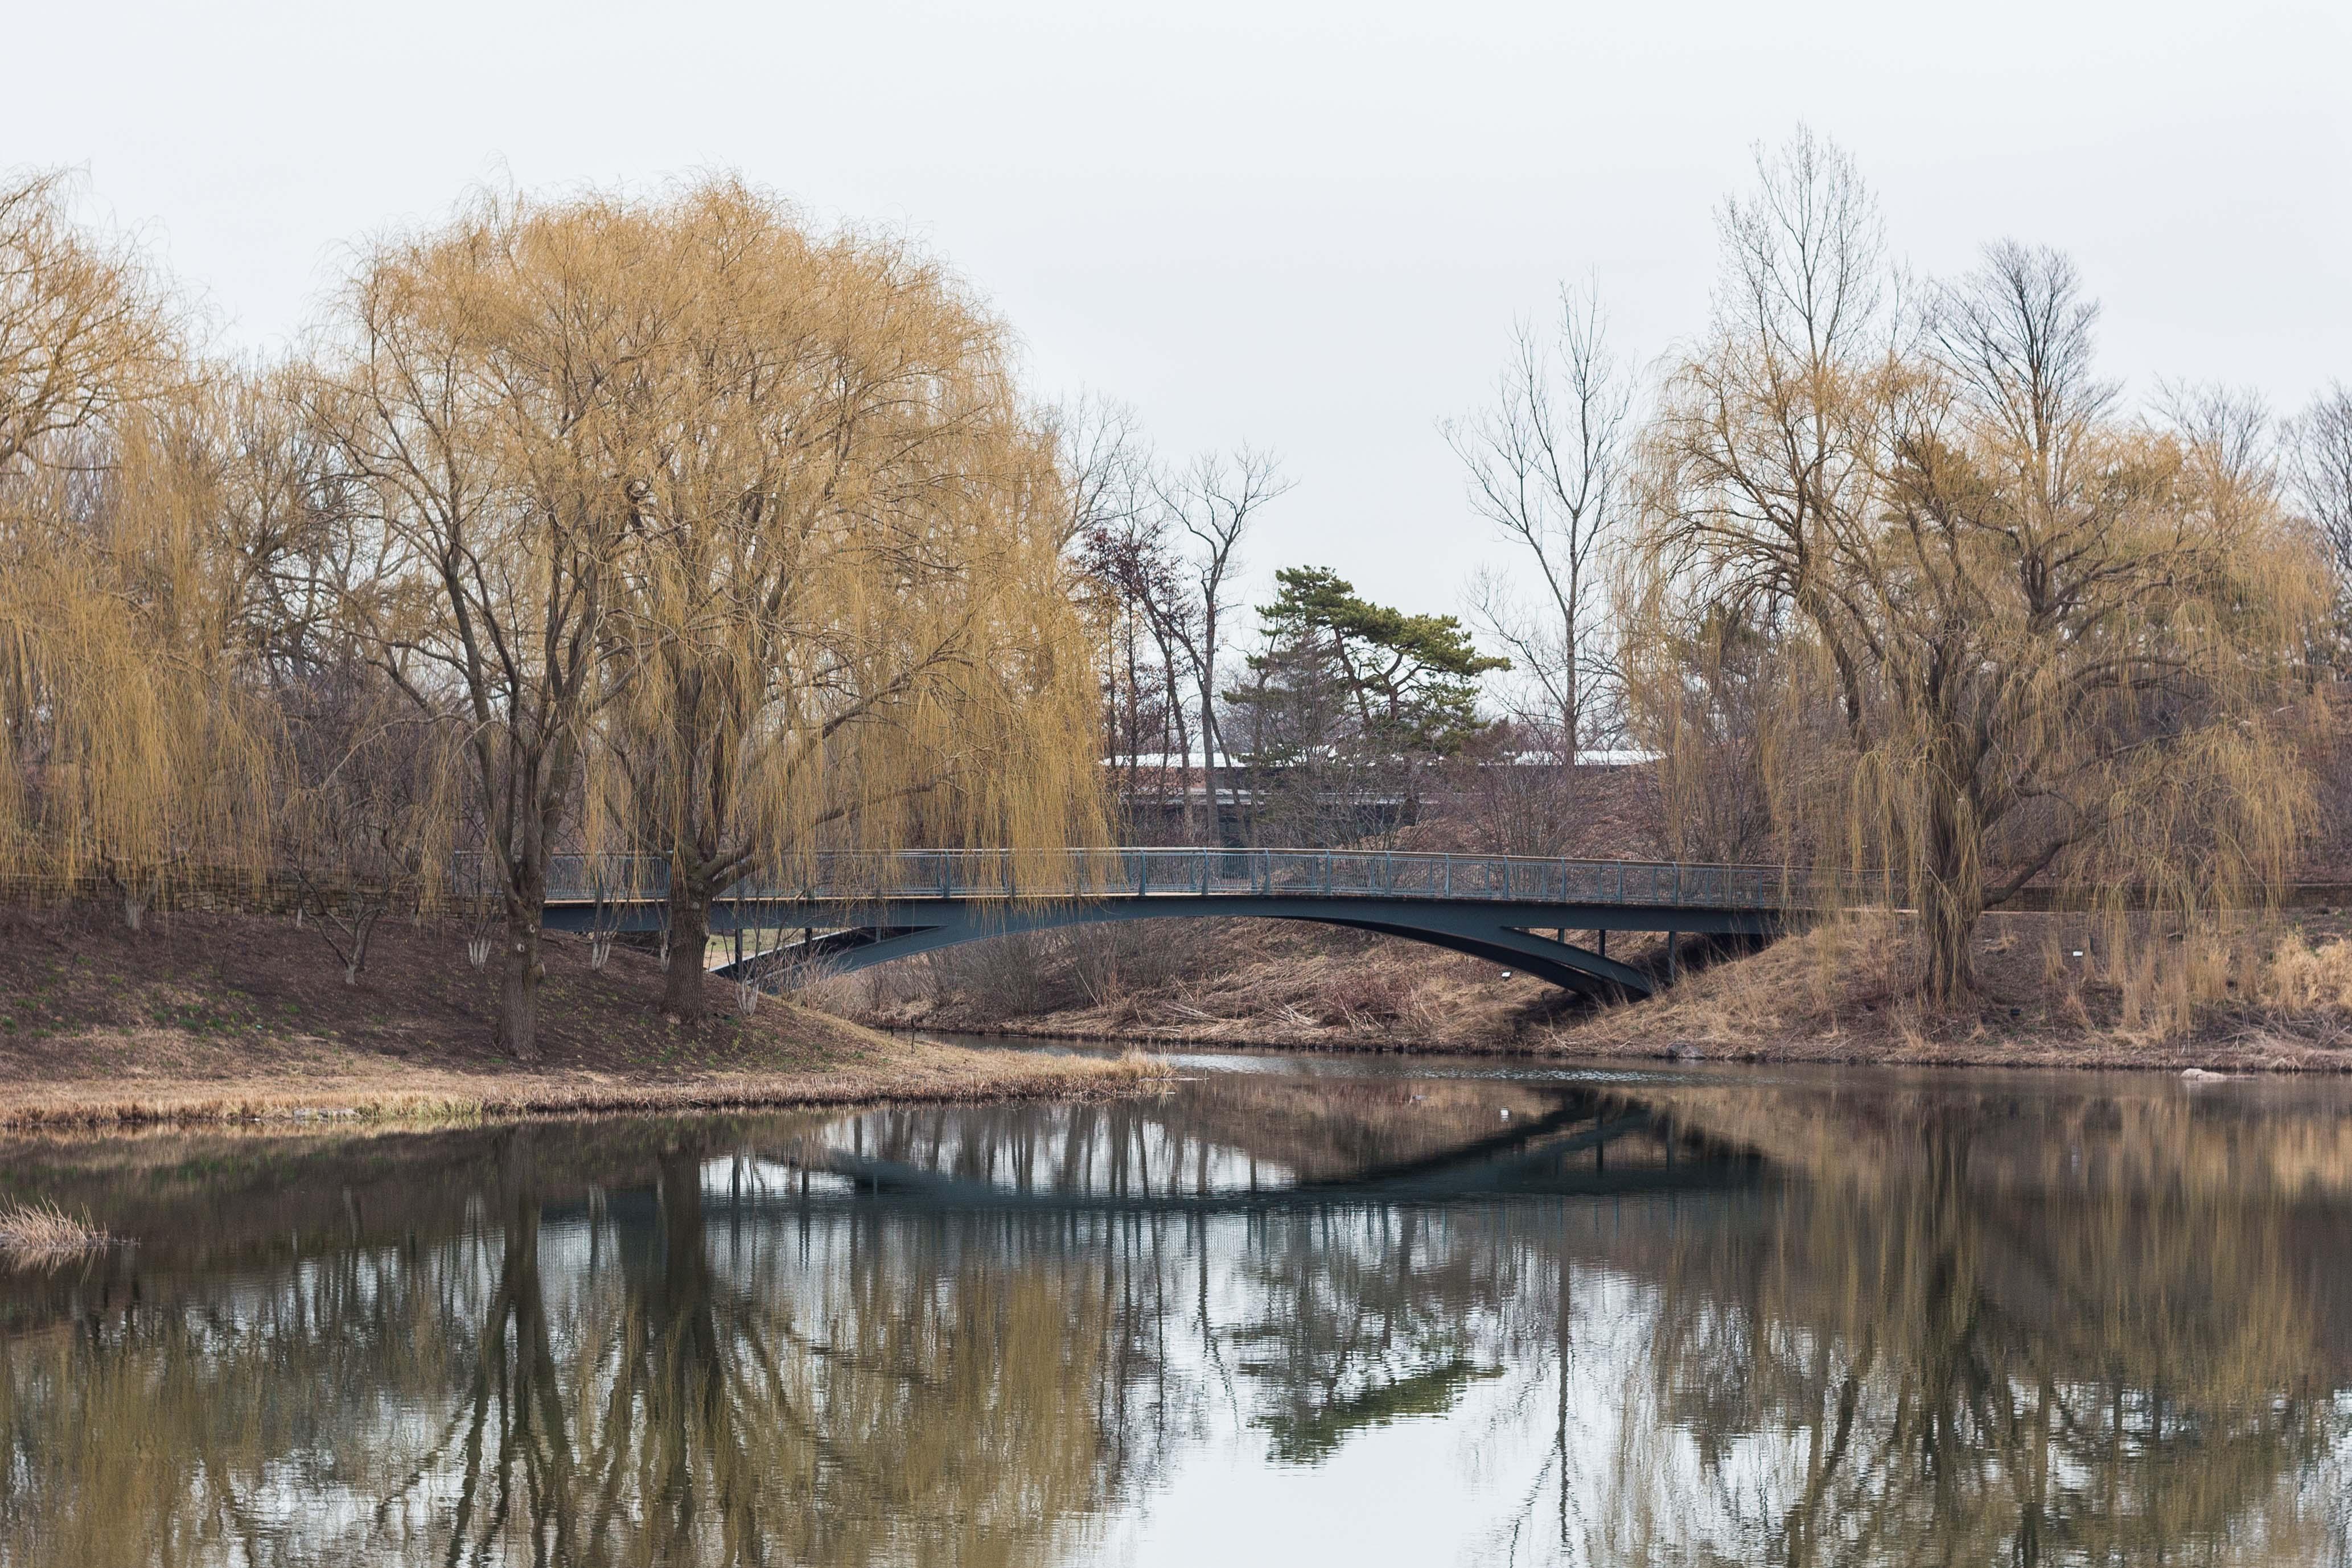 Chicago Botanic Gardens Lake Reflection | https://www.roseclearfield.com